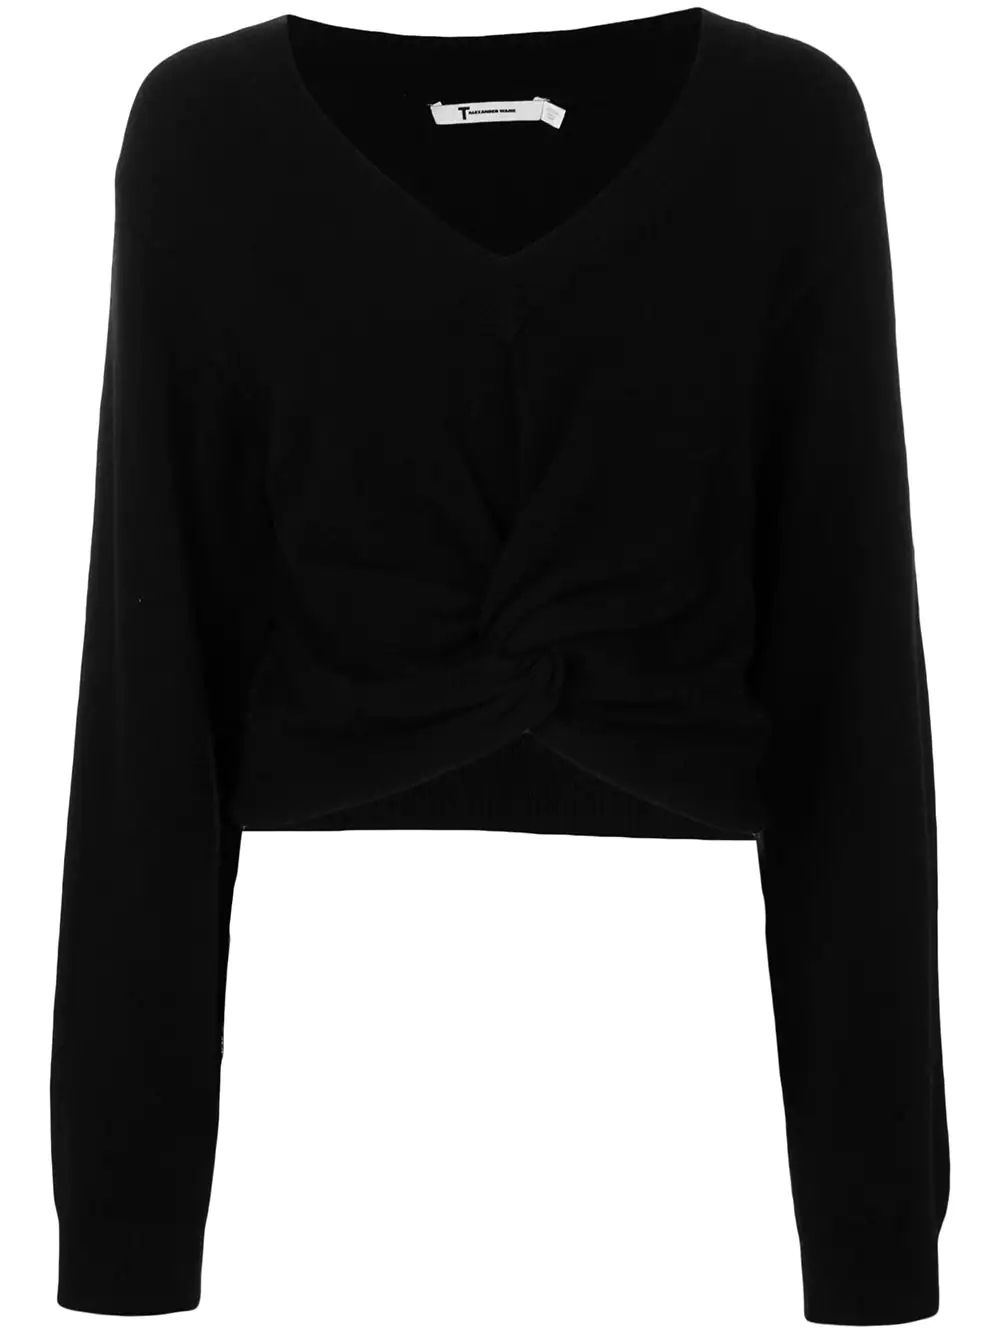 T by Alexander Wang | свитер с перекрученной деталью | Clouty